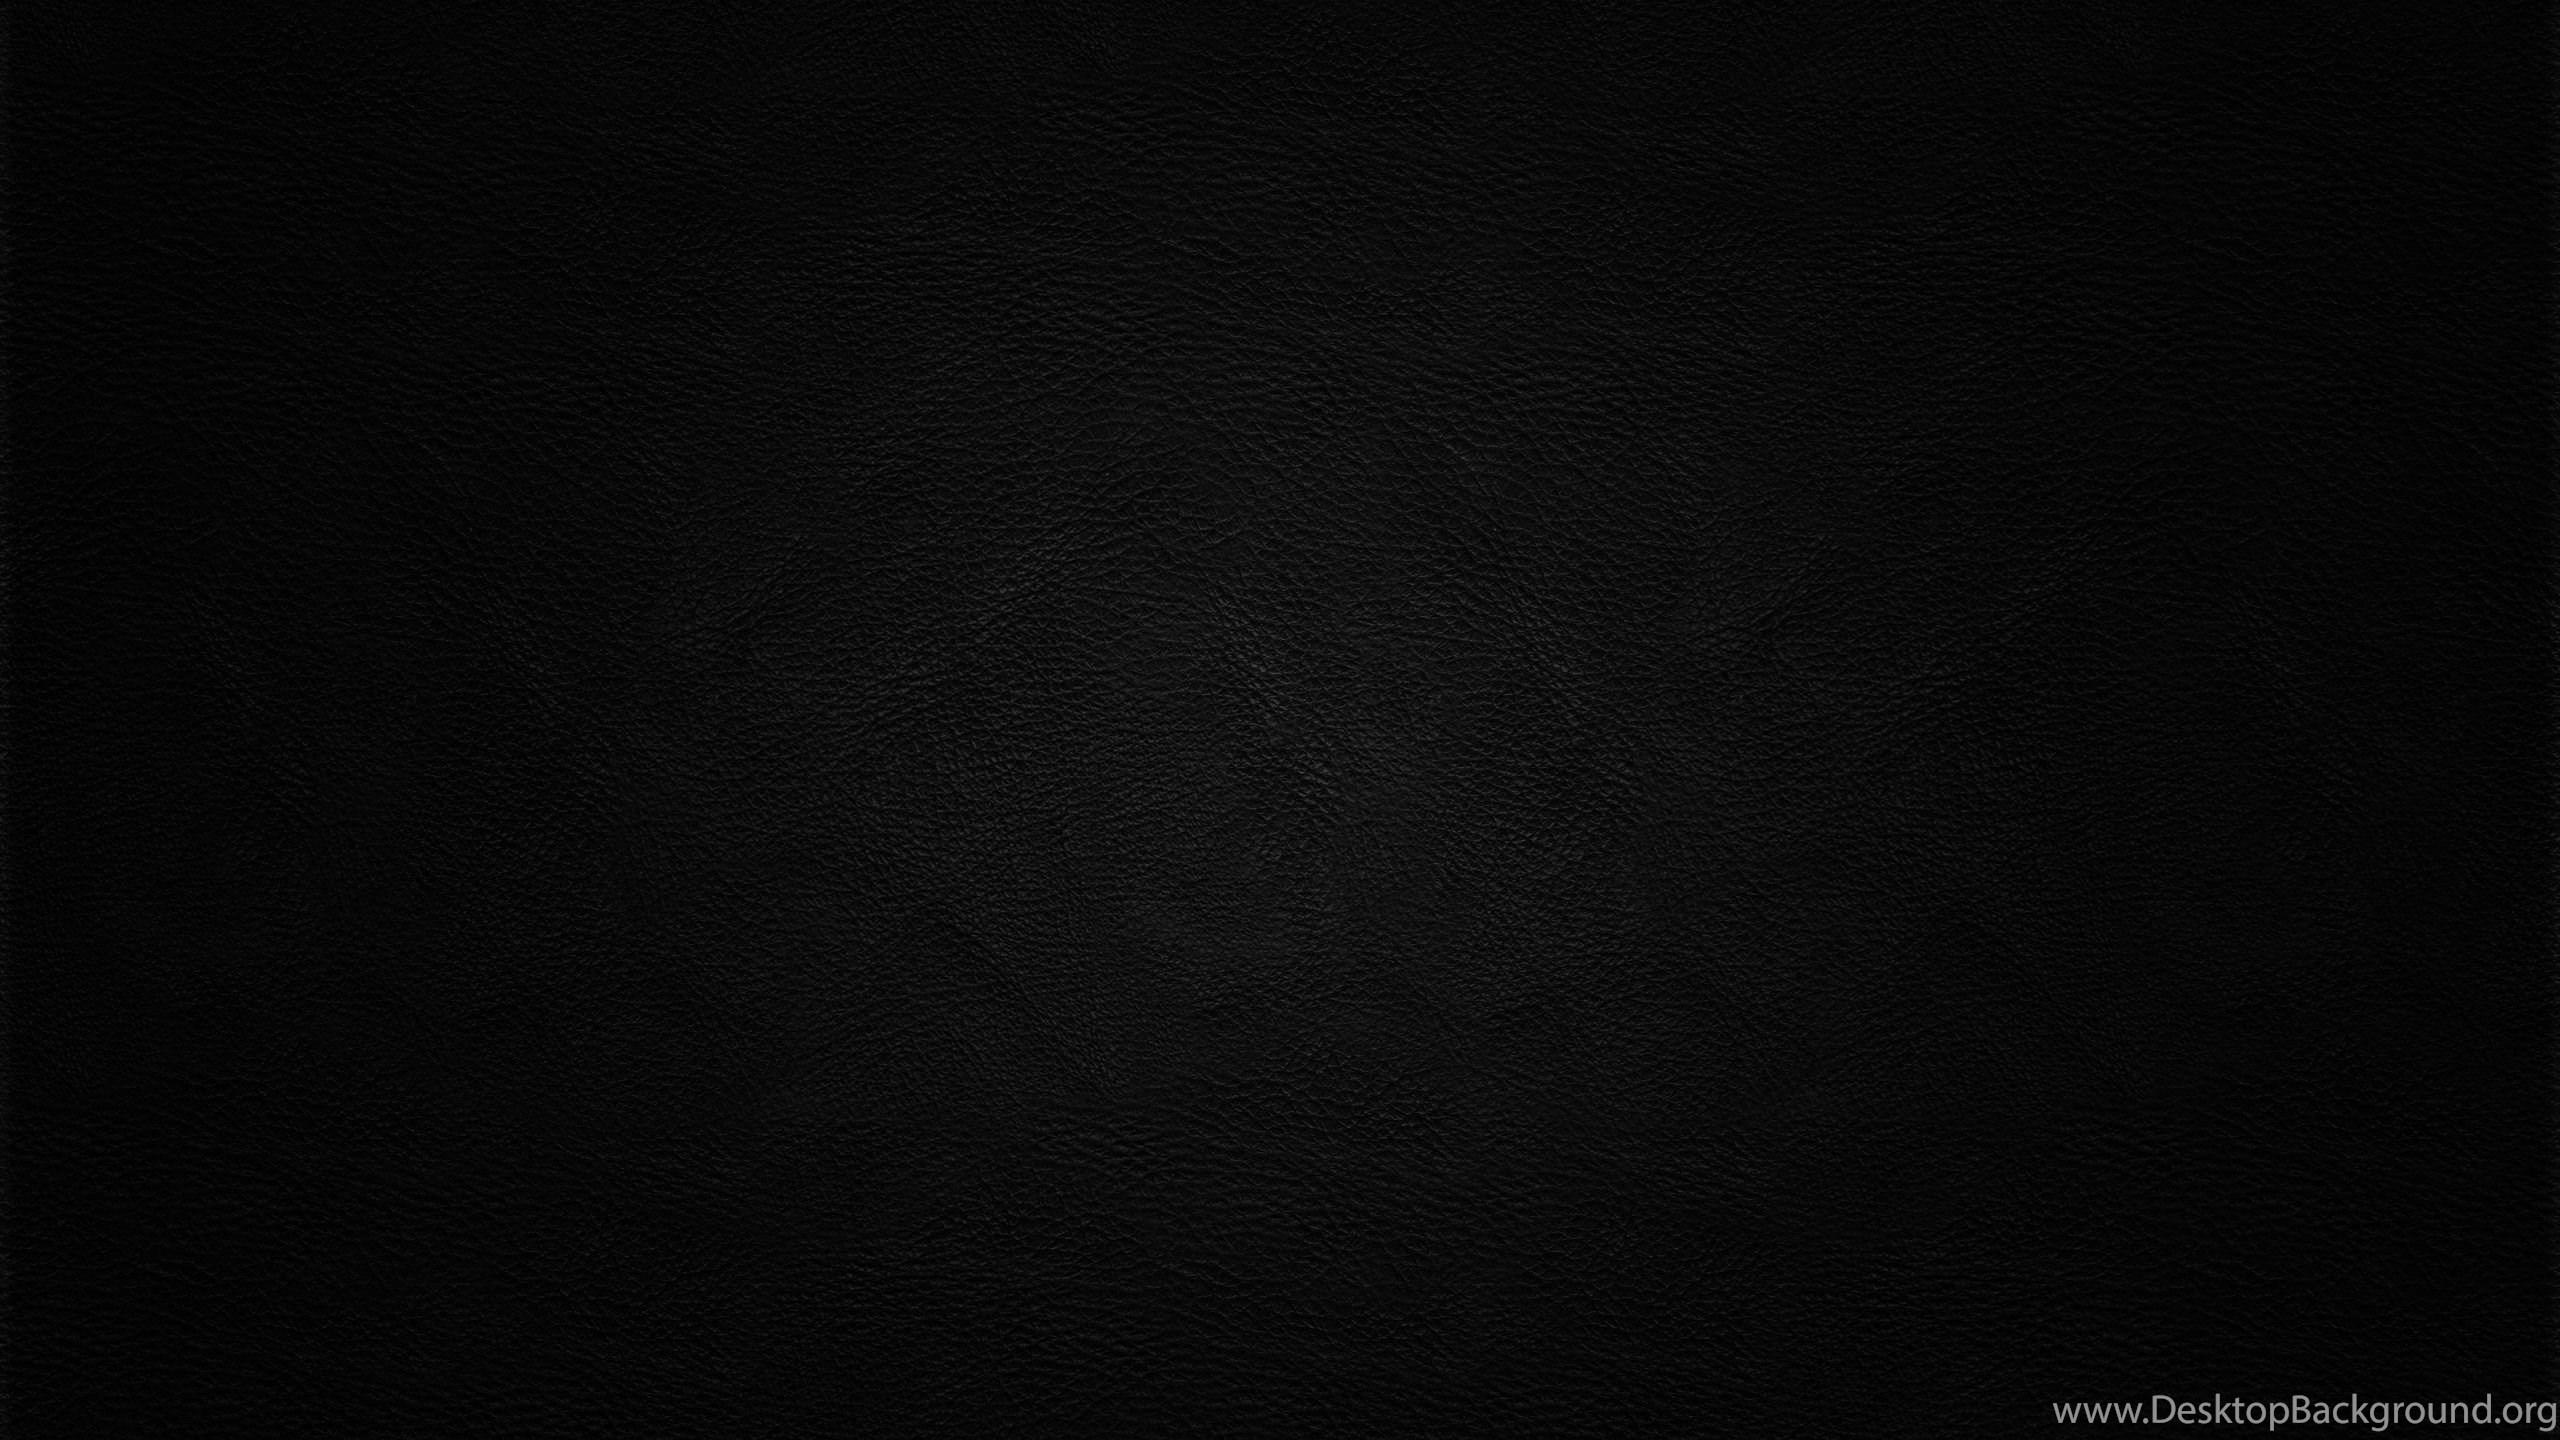 Black Wallpaper Hd.jpg Desktop Background